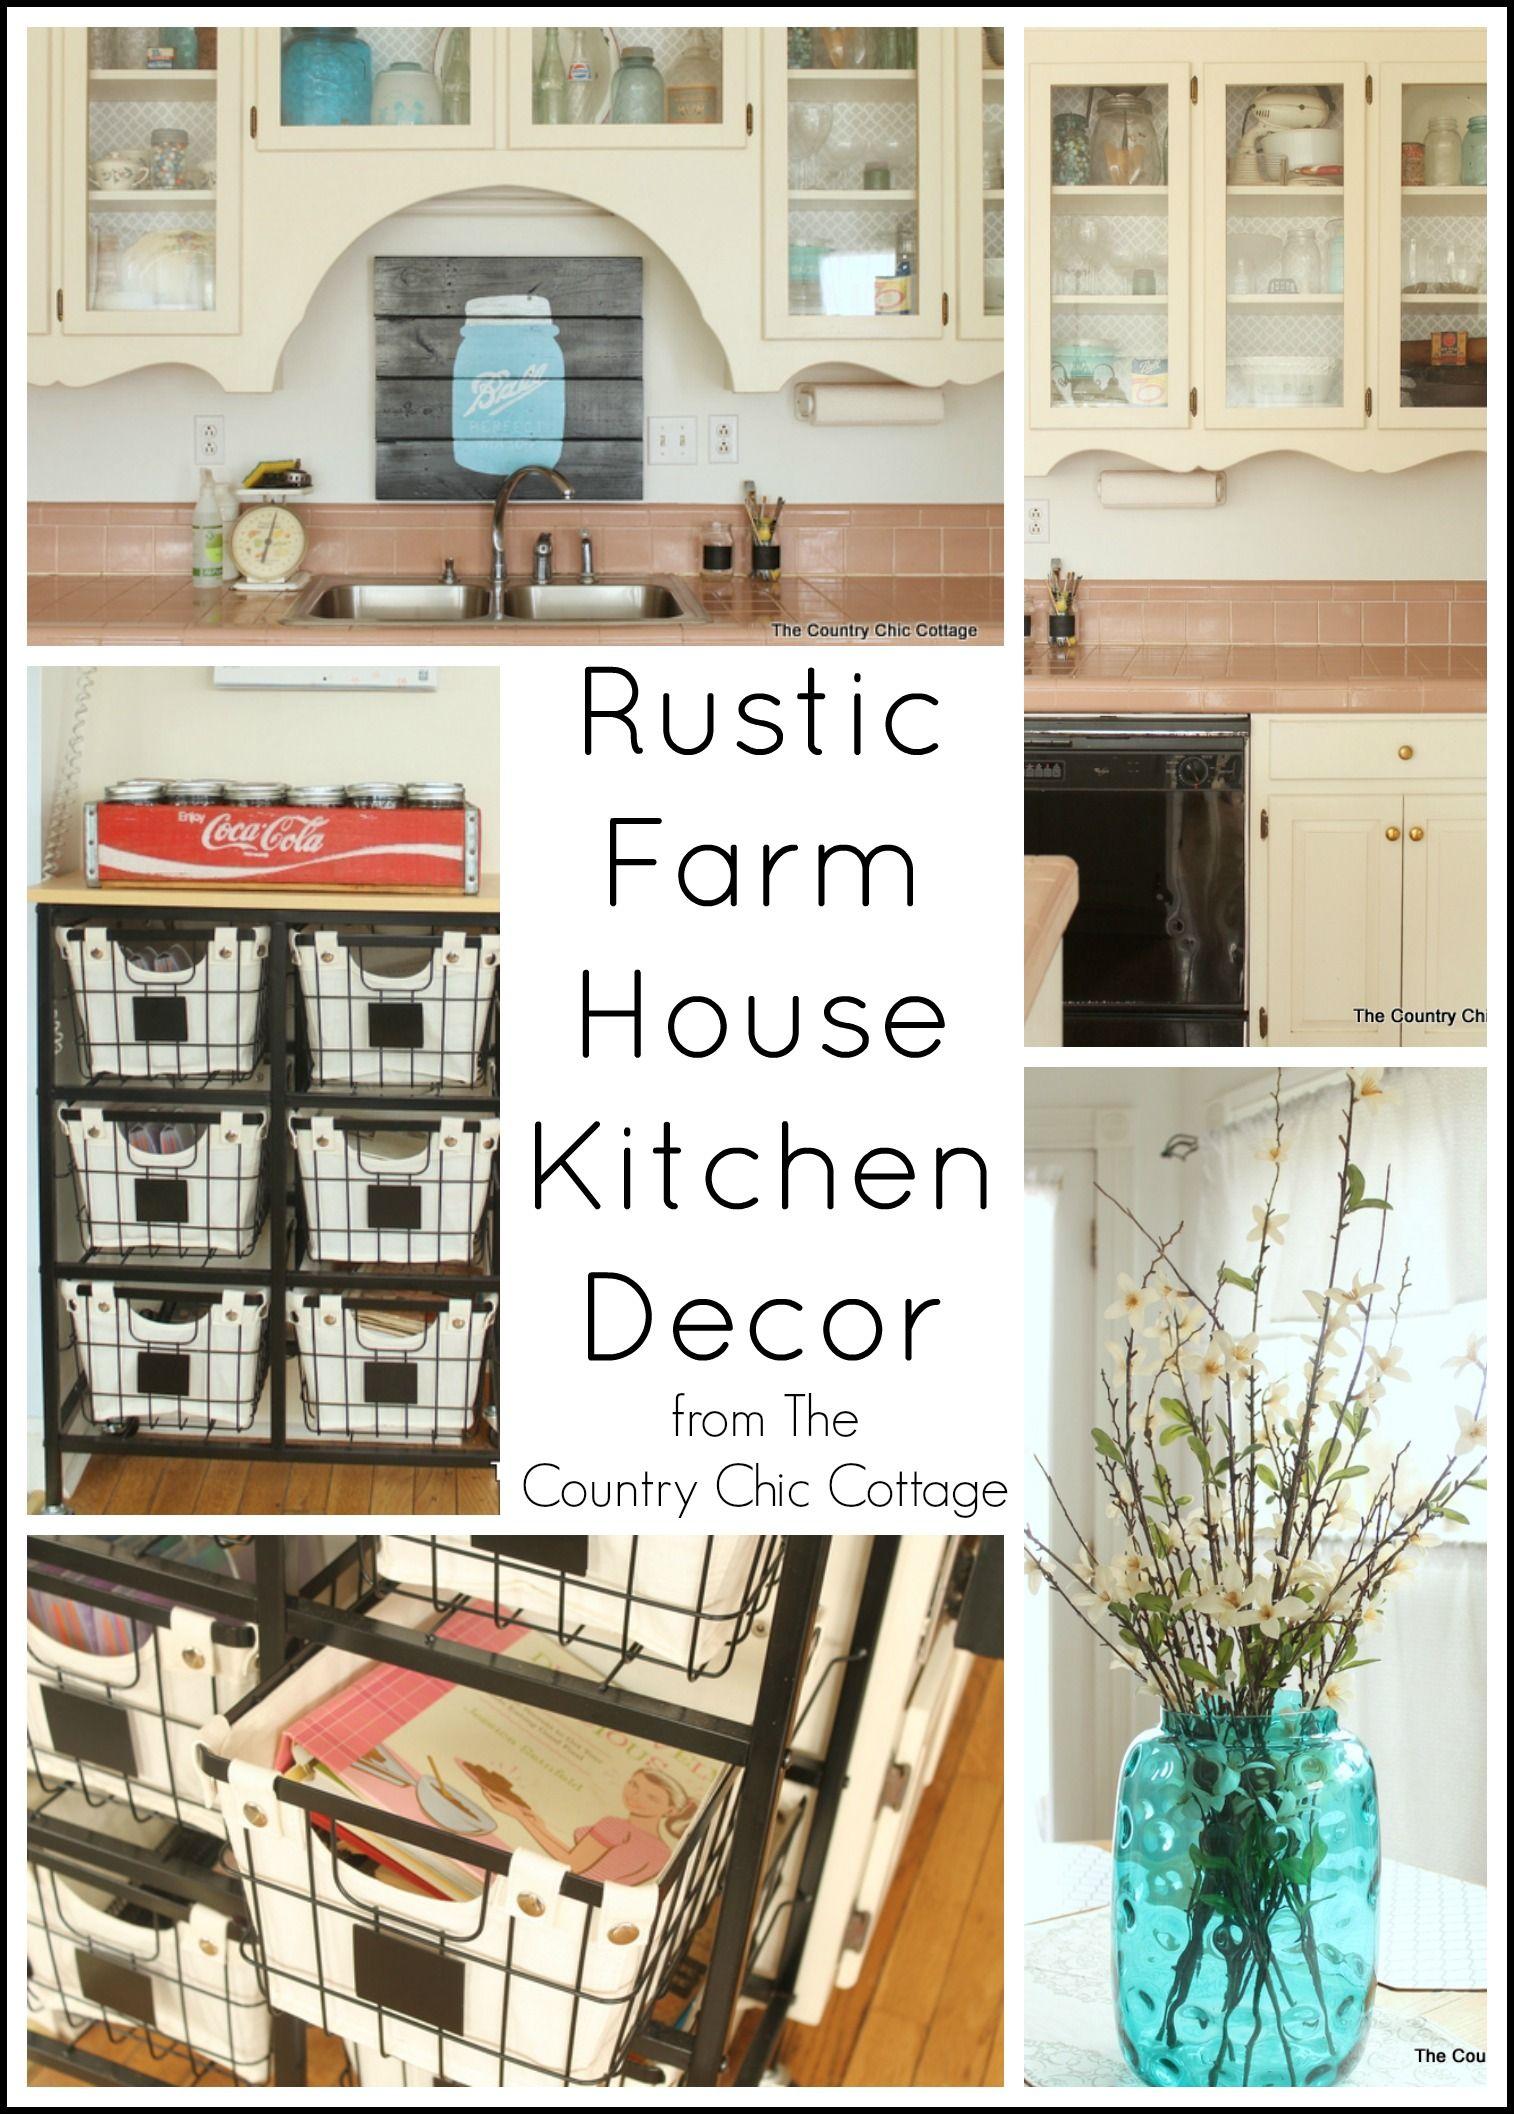 Rustic Farmhouse Kitchen Decor | Höhle, Löwin und Wohnideen